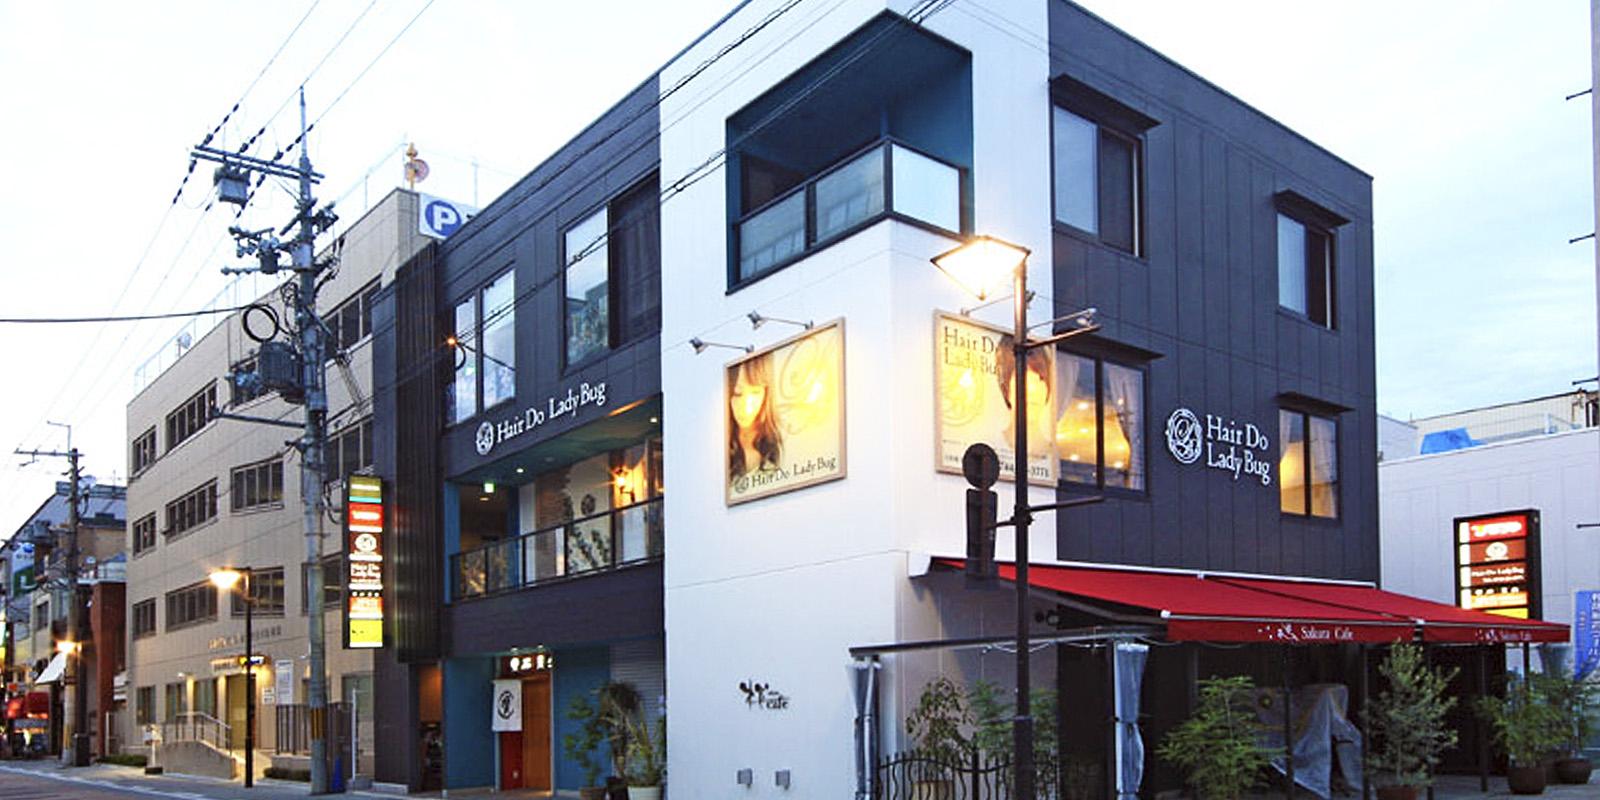 奈良 美容室HAIR DO LADY BUG 【美容室:レディバグ】 国道24号線 奈良県八木店